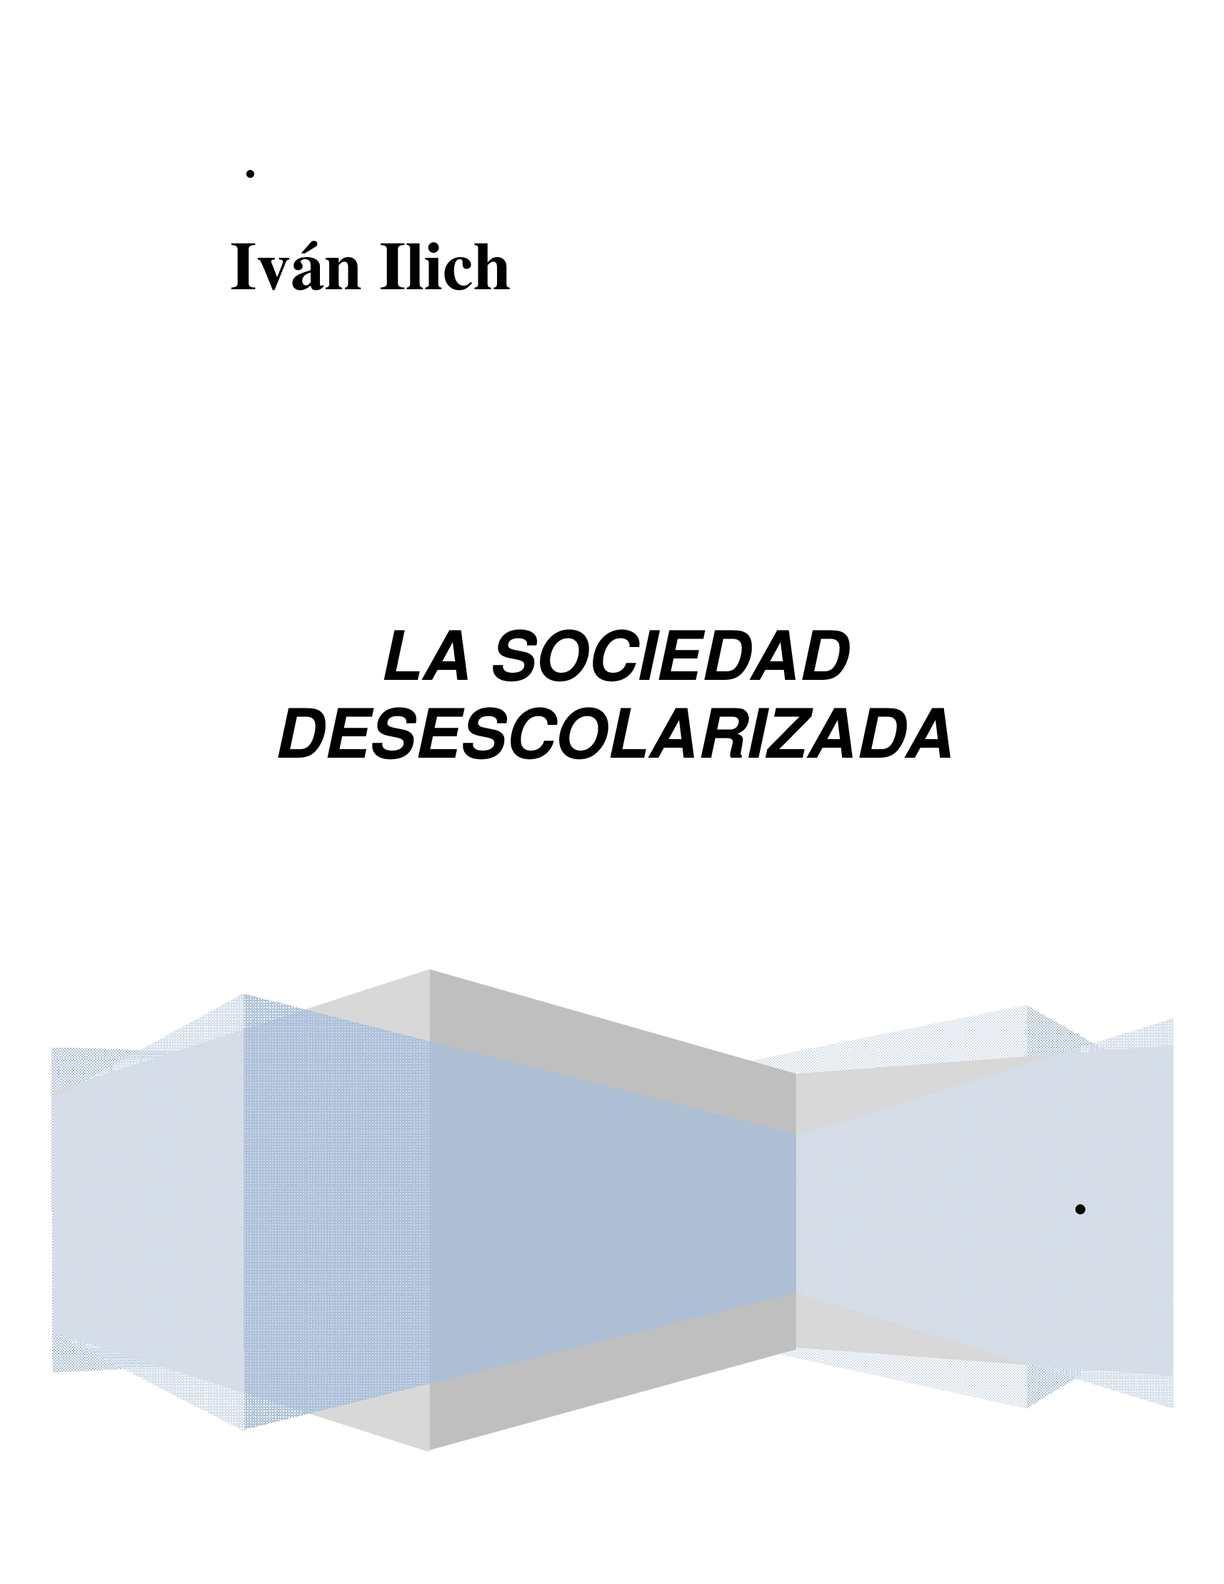 Calaméo - GI - IVAN LLICH - LA SOCIEDAD DESESCOLARIZADA